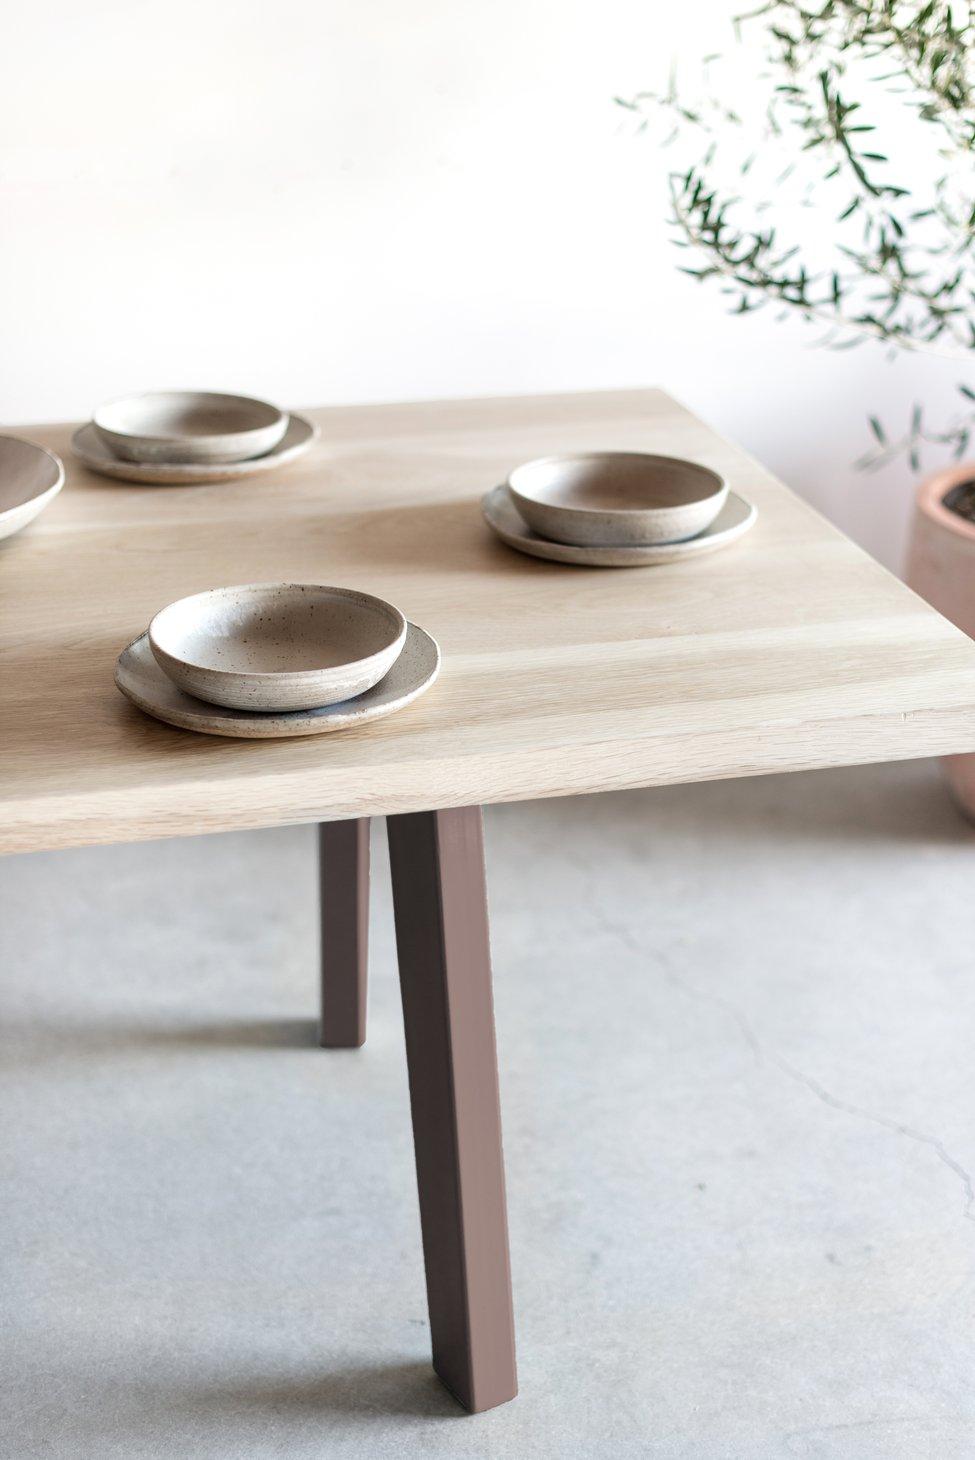 SIERRA_DINING_TABLE_CROFT_HOUSE_5_of_6_975x.jpg